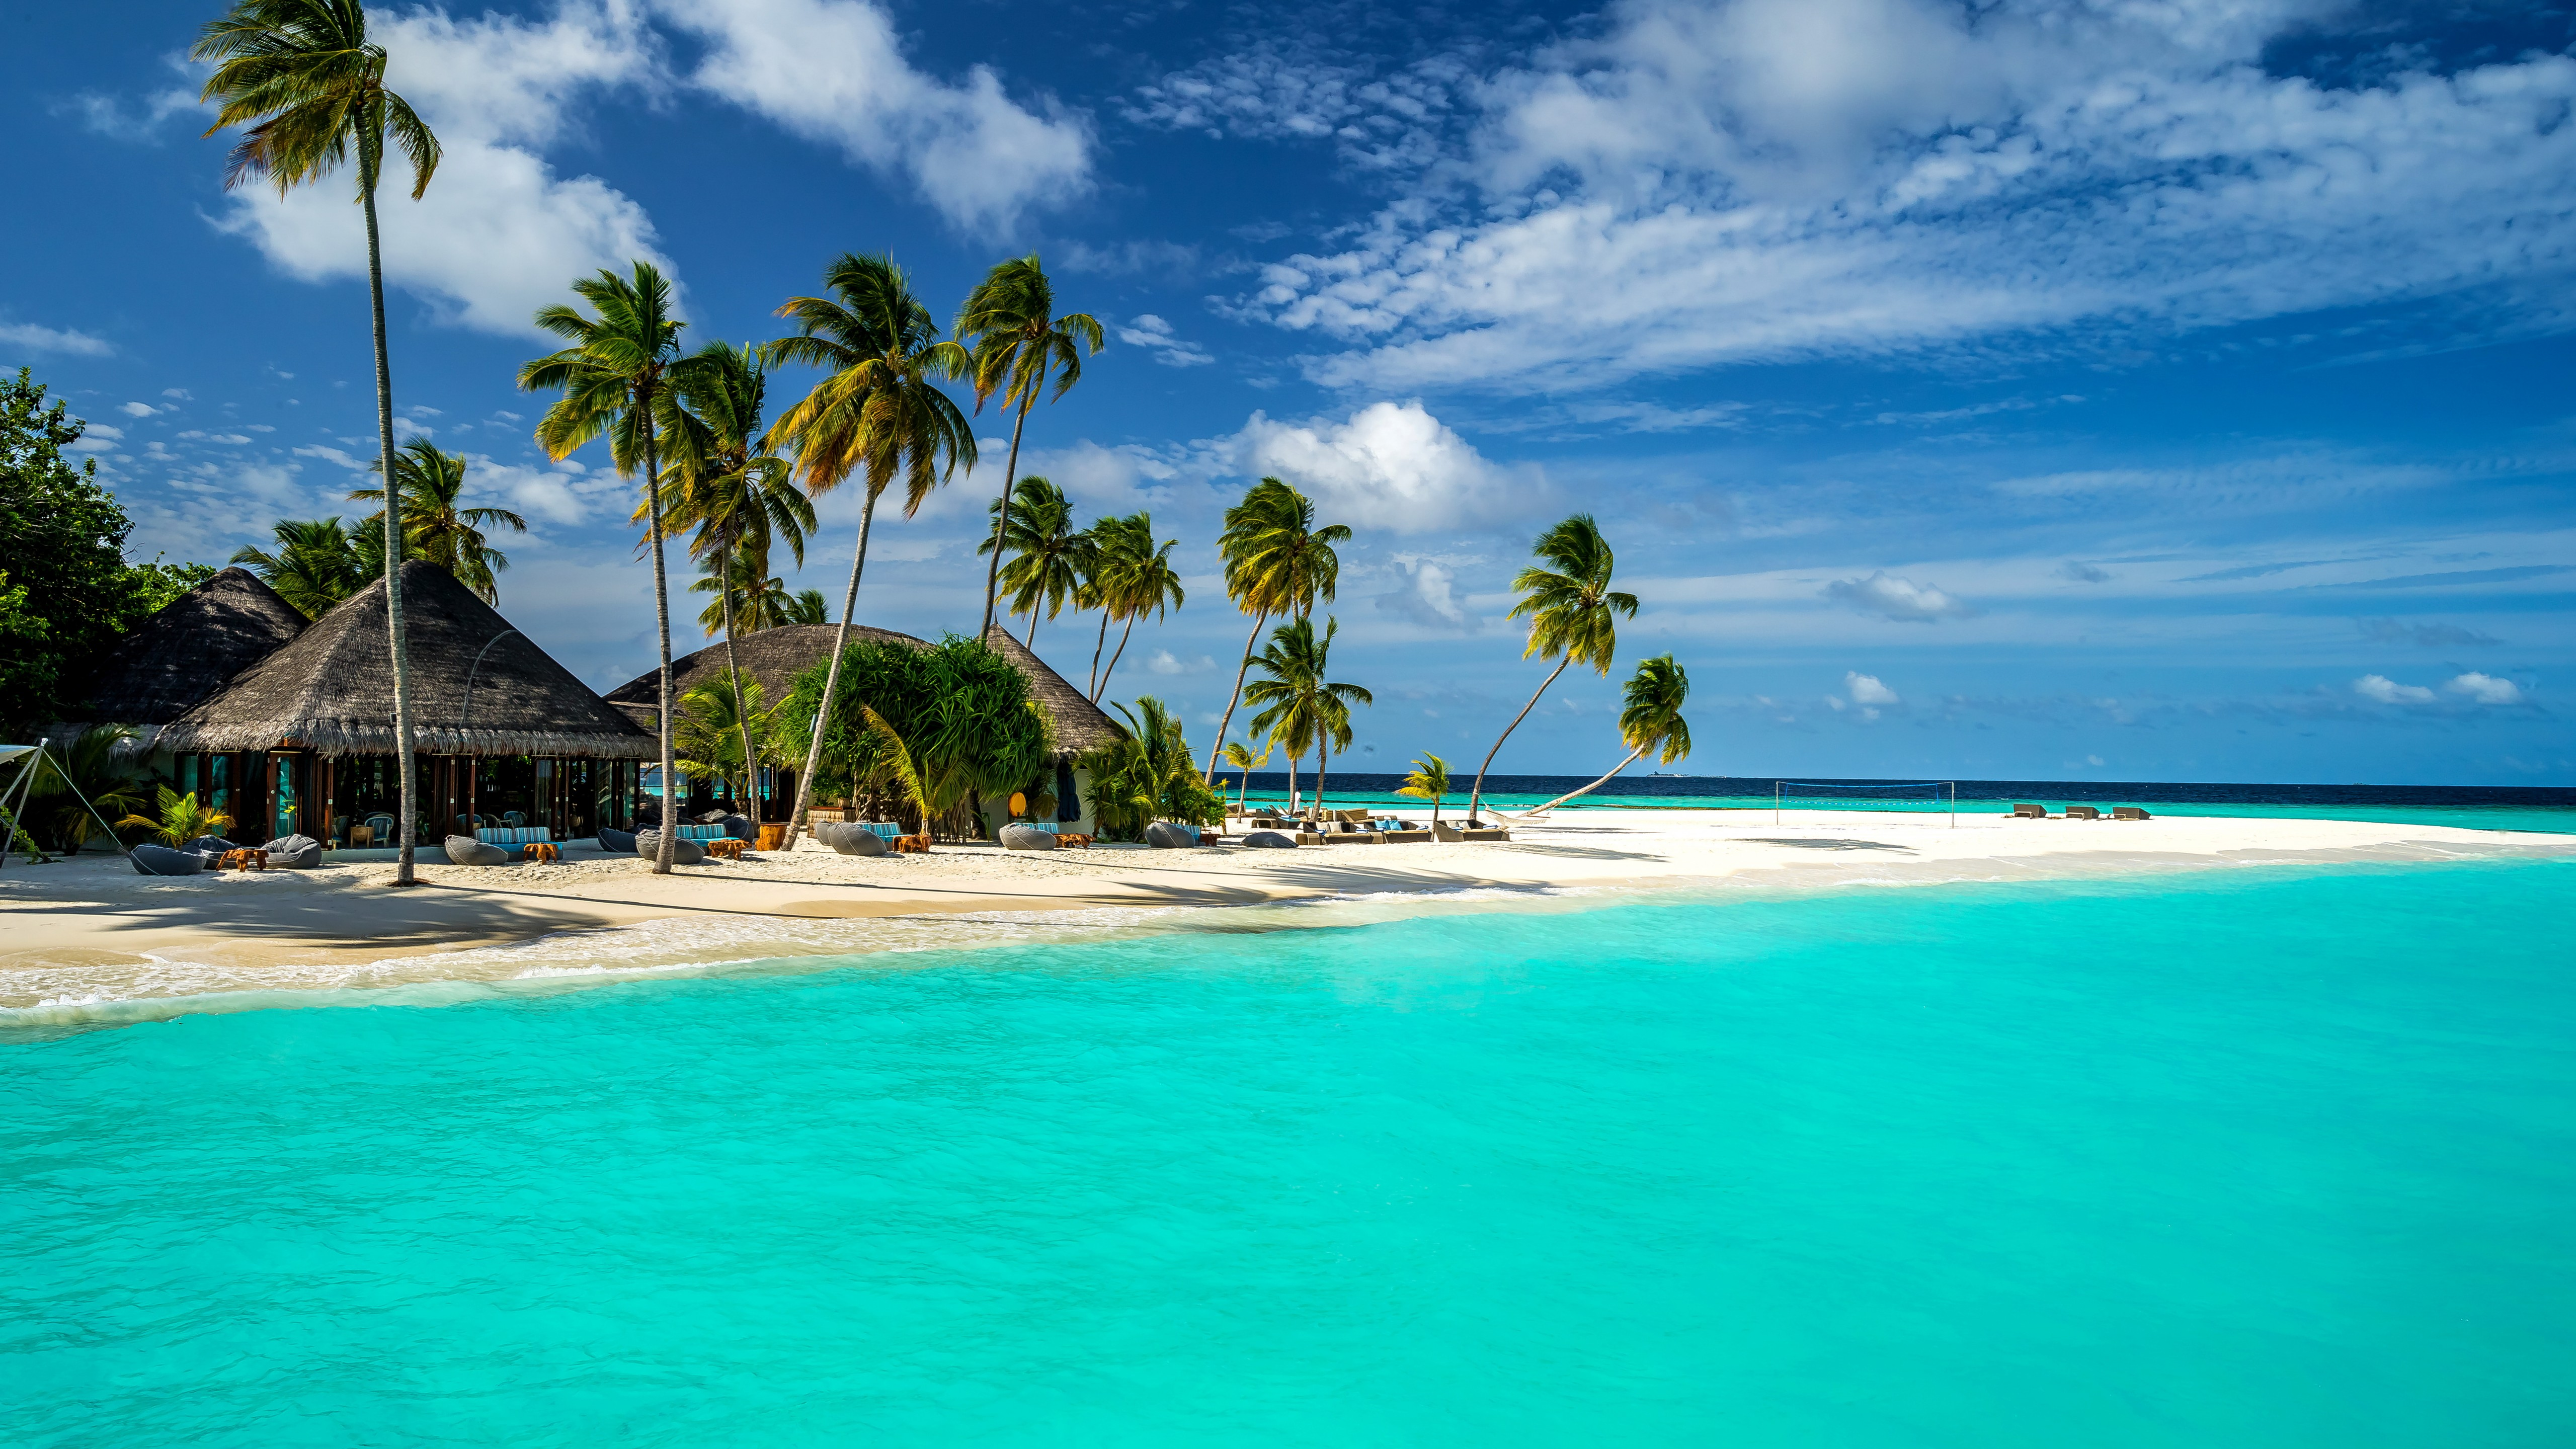 Wallpaper Beach in Maldives